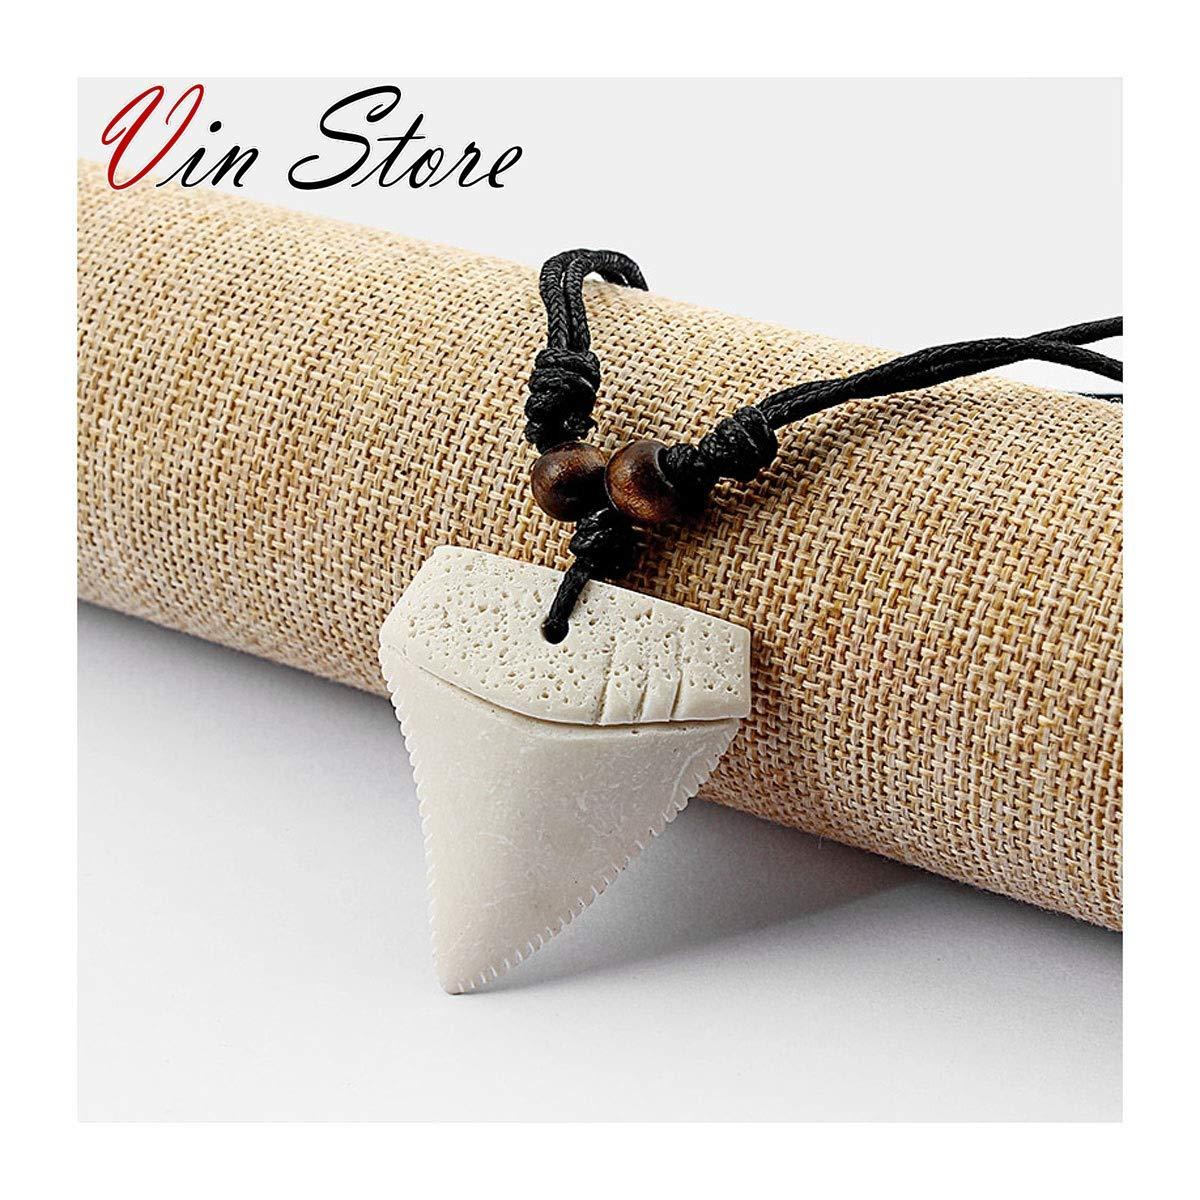 Vin Store Shark Tooth Necklace with Wood Beads Handmade Hawaiian Style Beach for Boys Girls